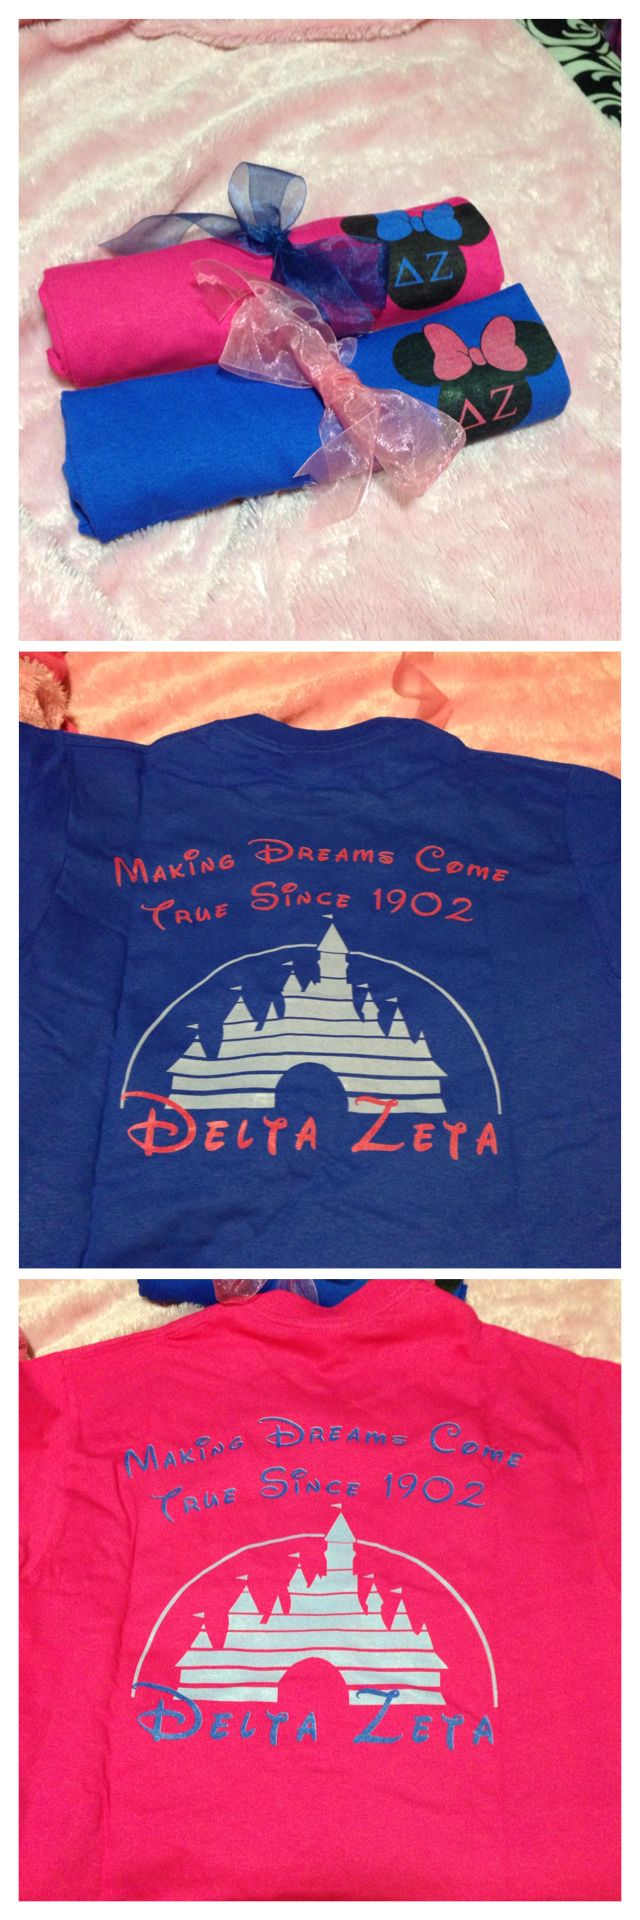 Delta Zeta sorority Walt Disney World shirts